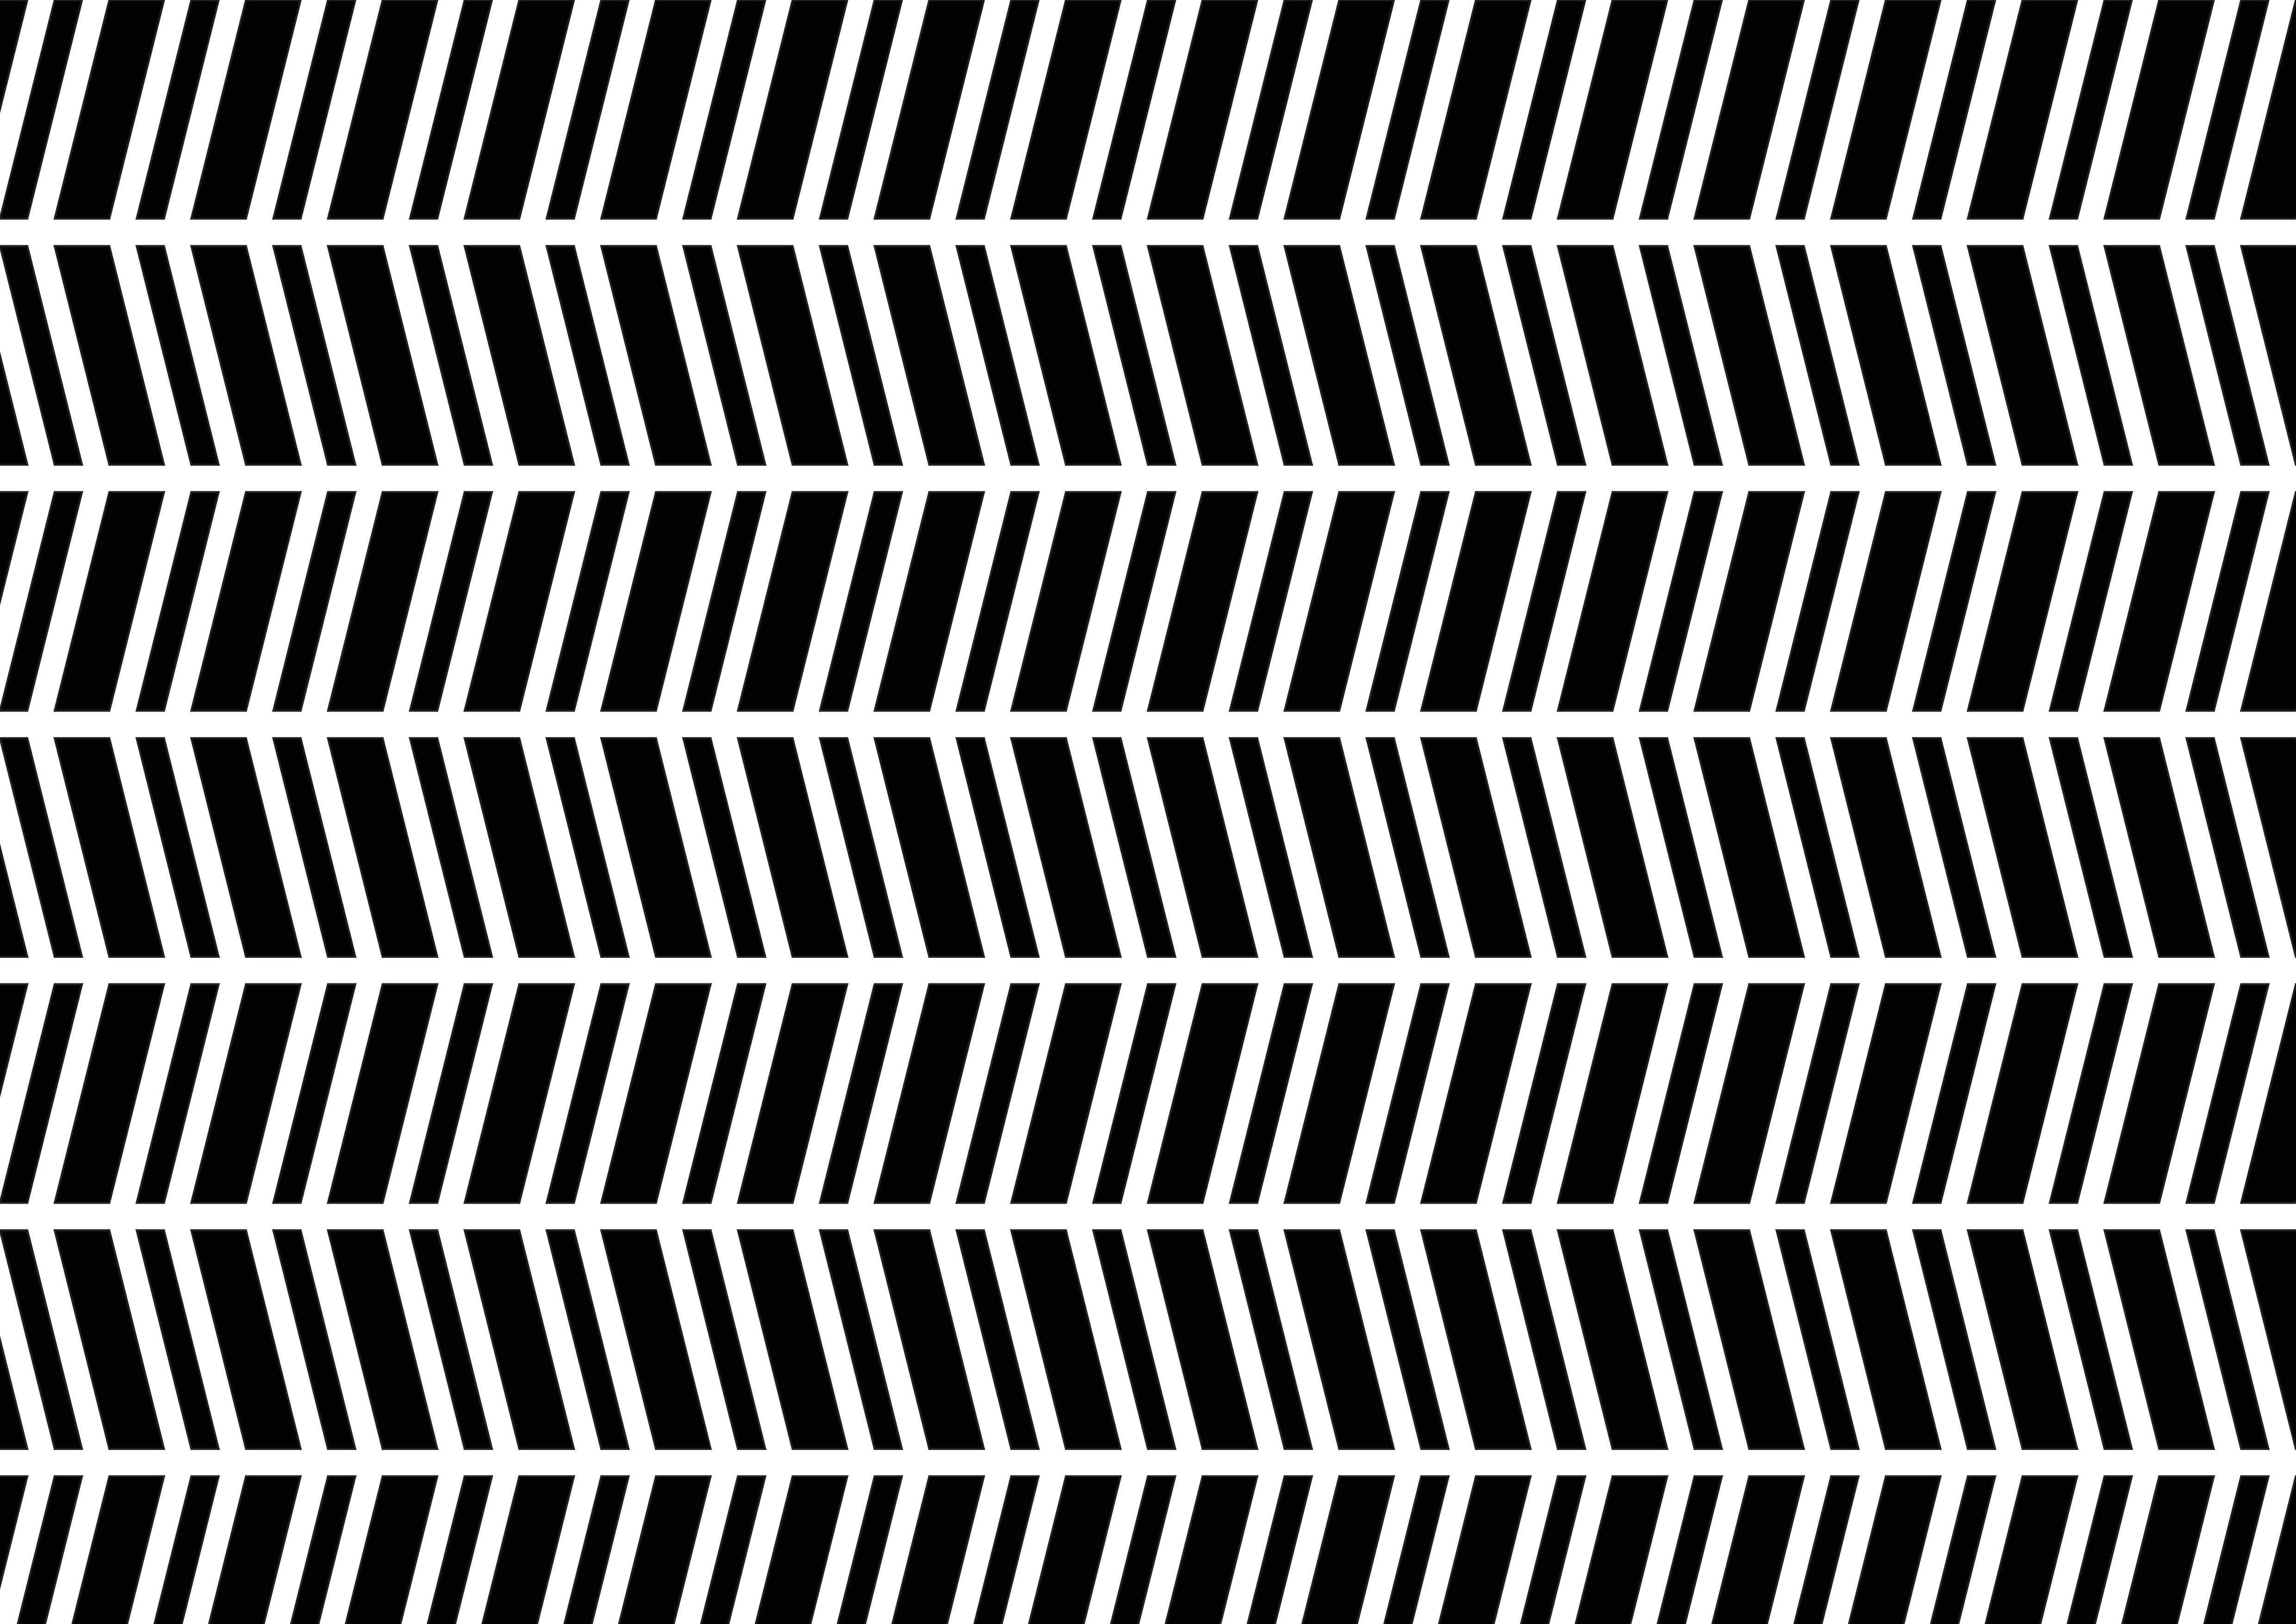 Stripe 23-01